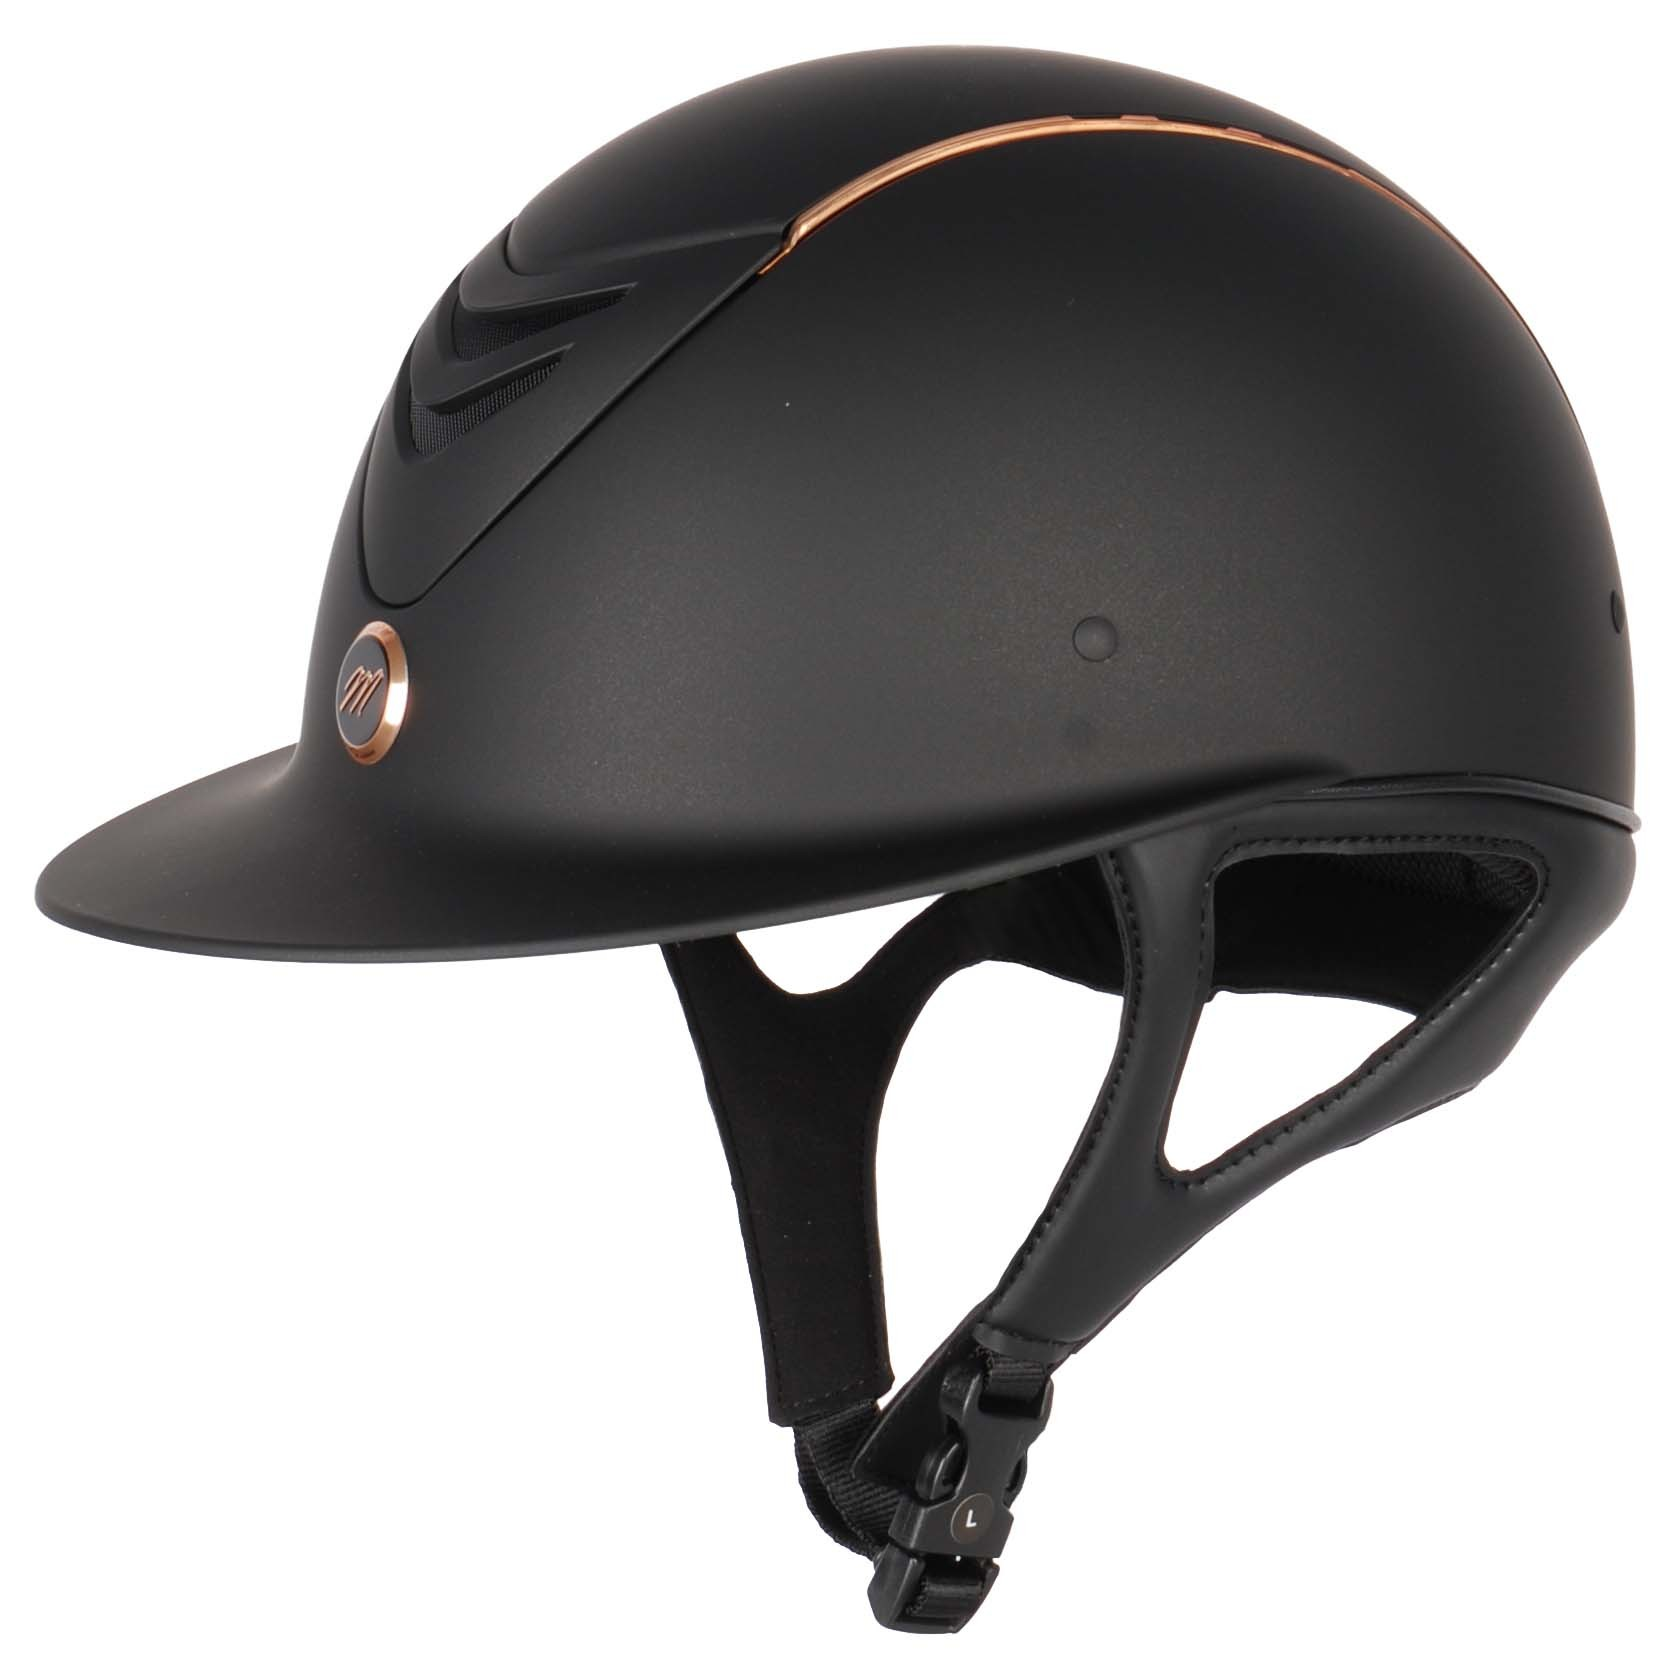 Equitheme Elegance Rose helmet